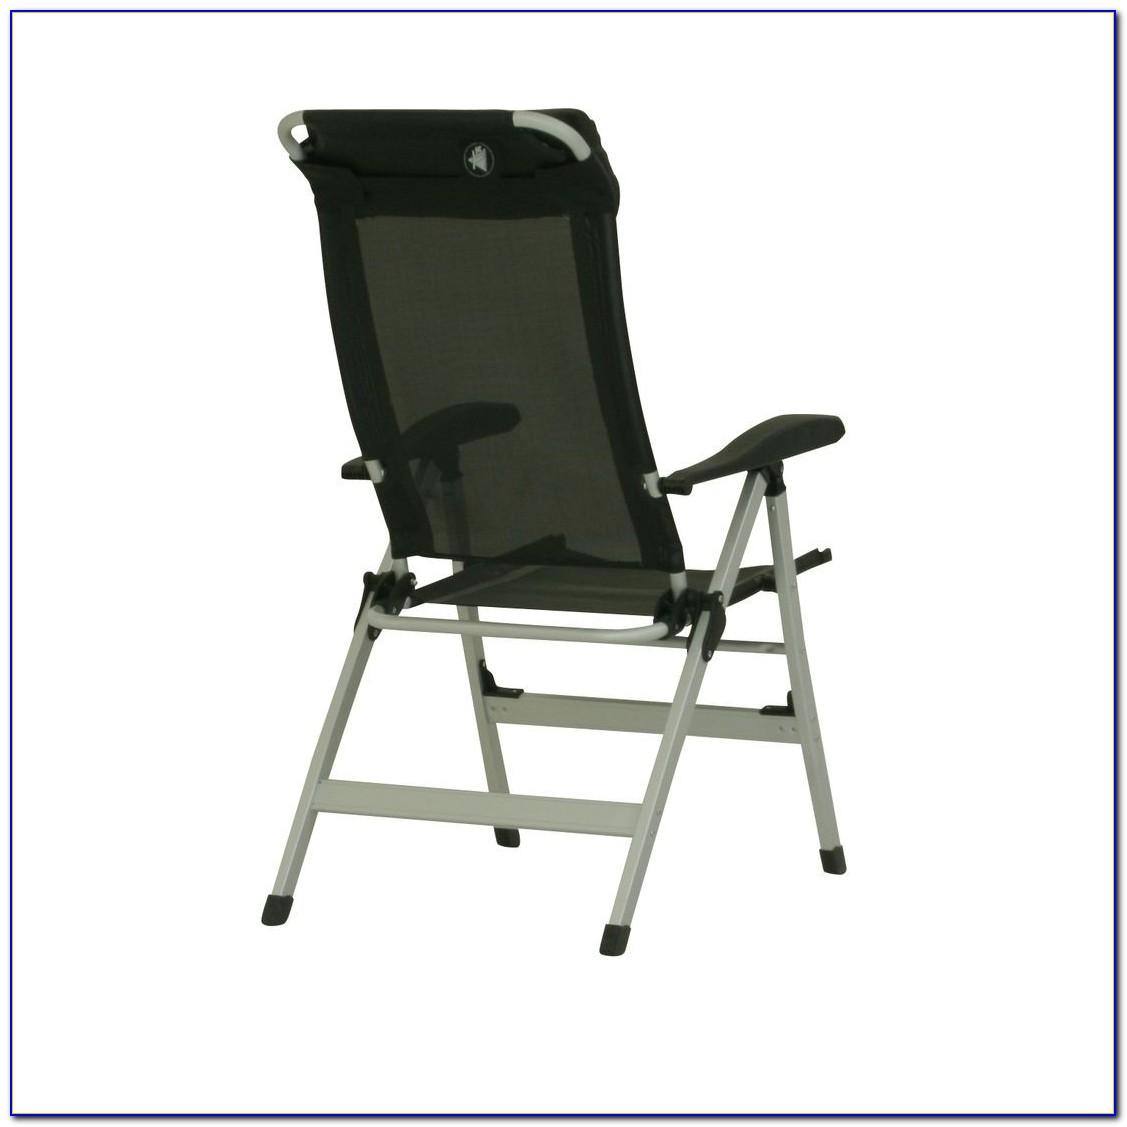 High Back Folding Garden Chairs